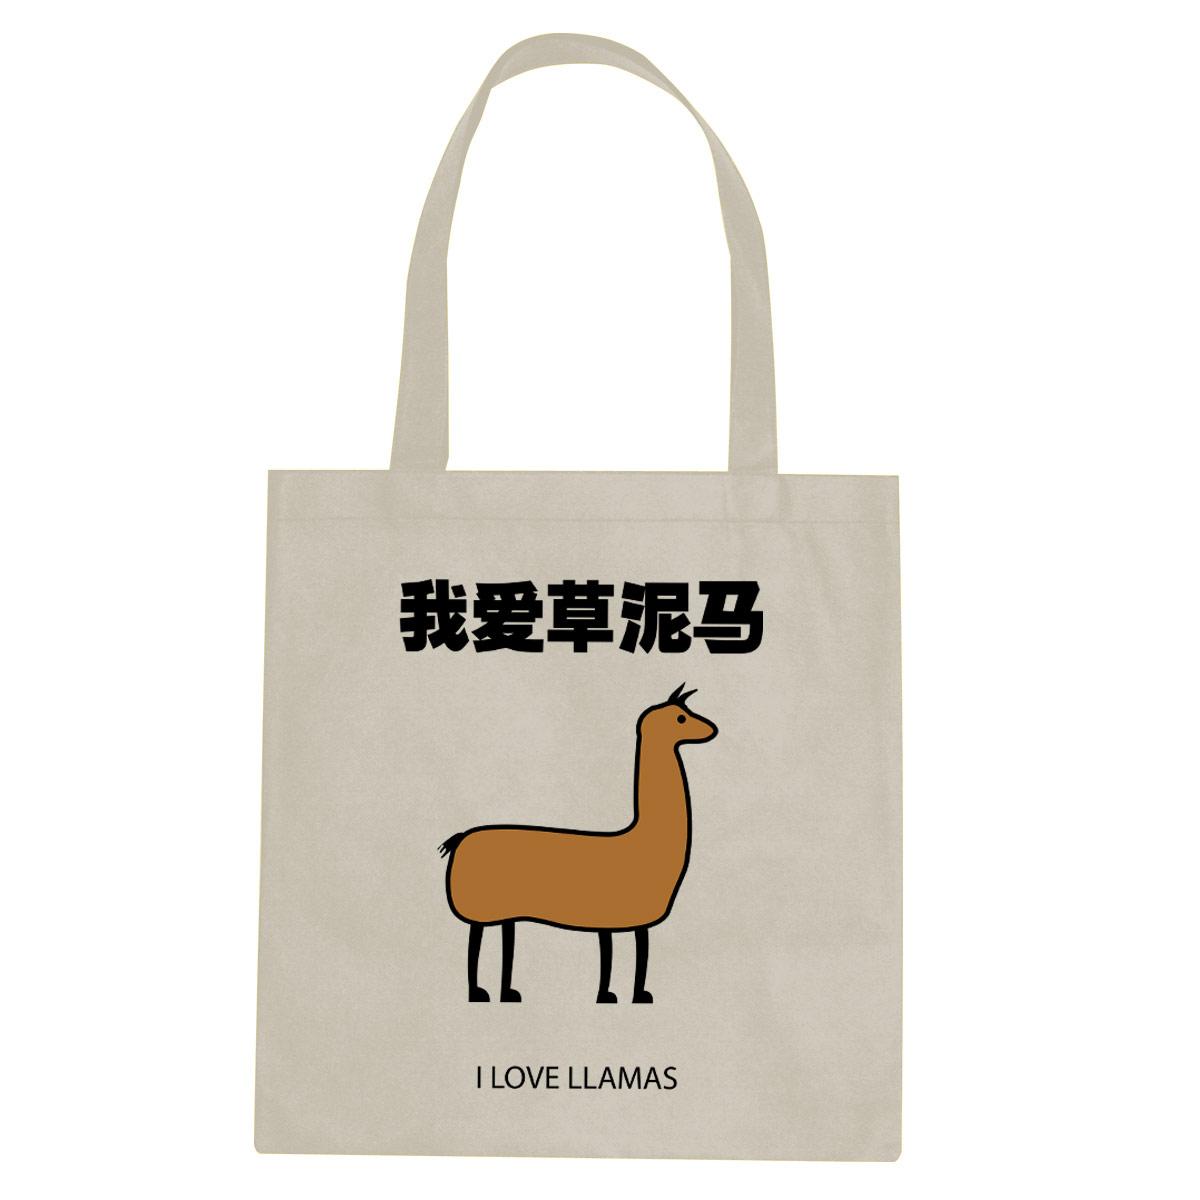 Chinese Loves Llamas tote bag  €14.99 Available in natural, black